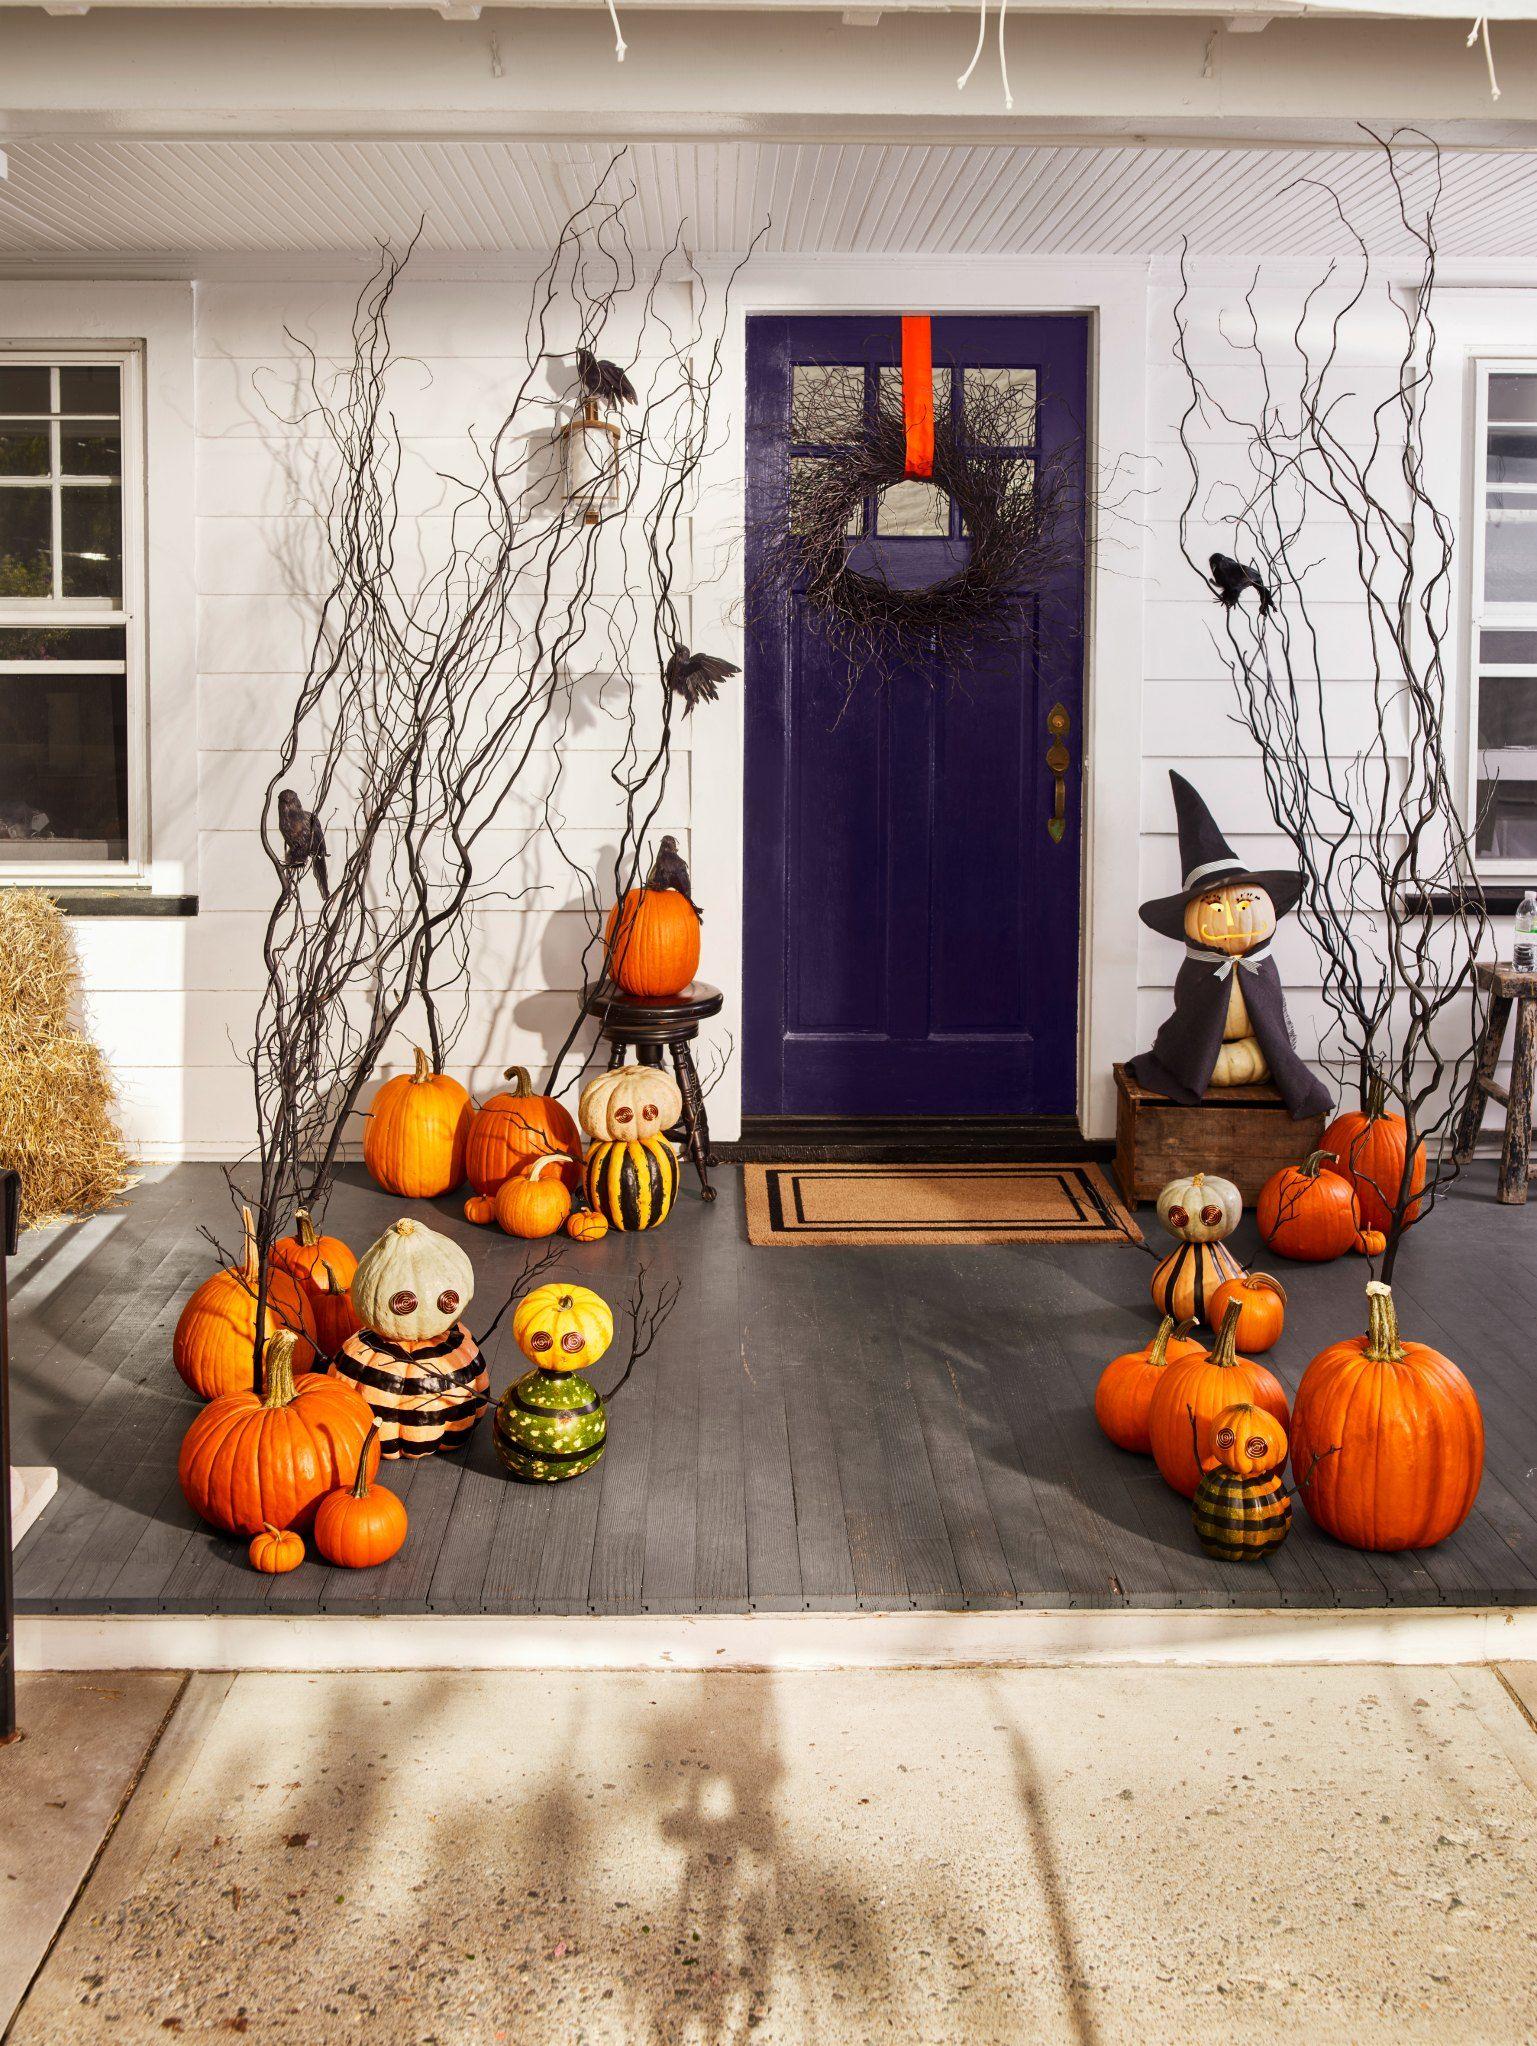 54 Easy Halloween Decorations , Spooky Home Decor Ideas for